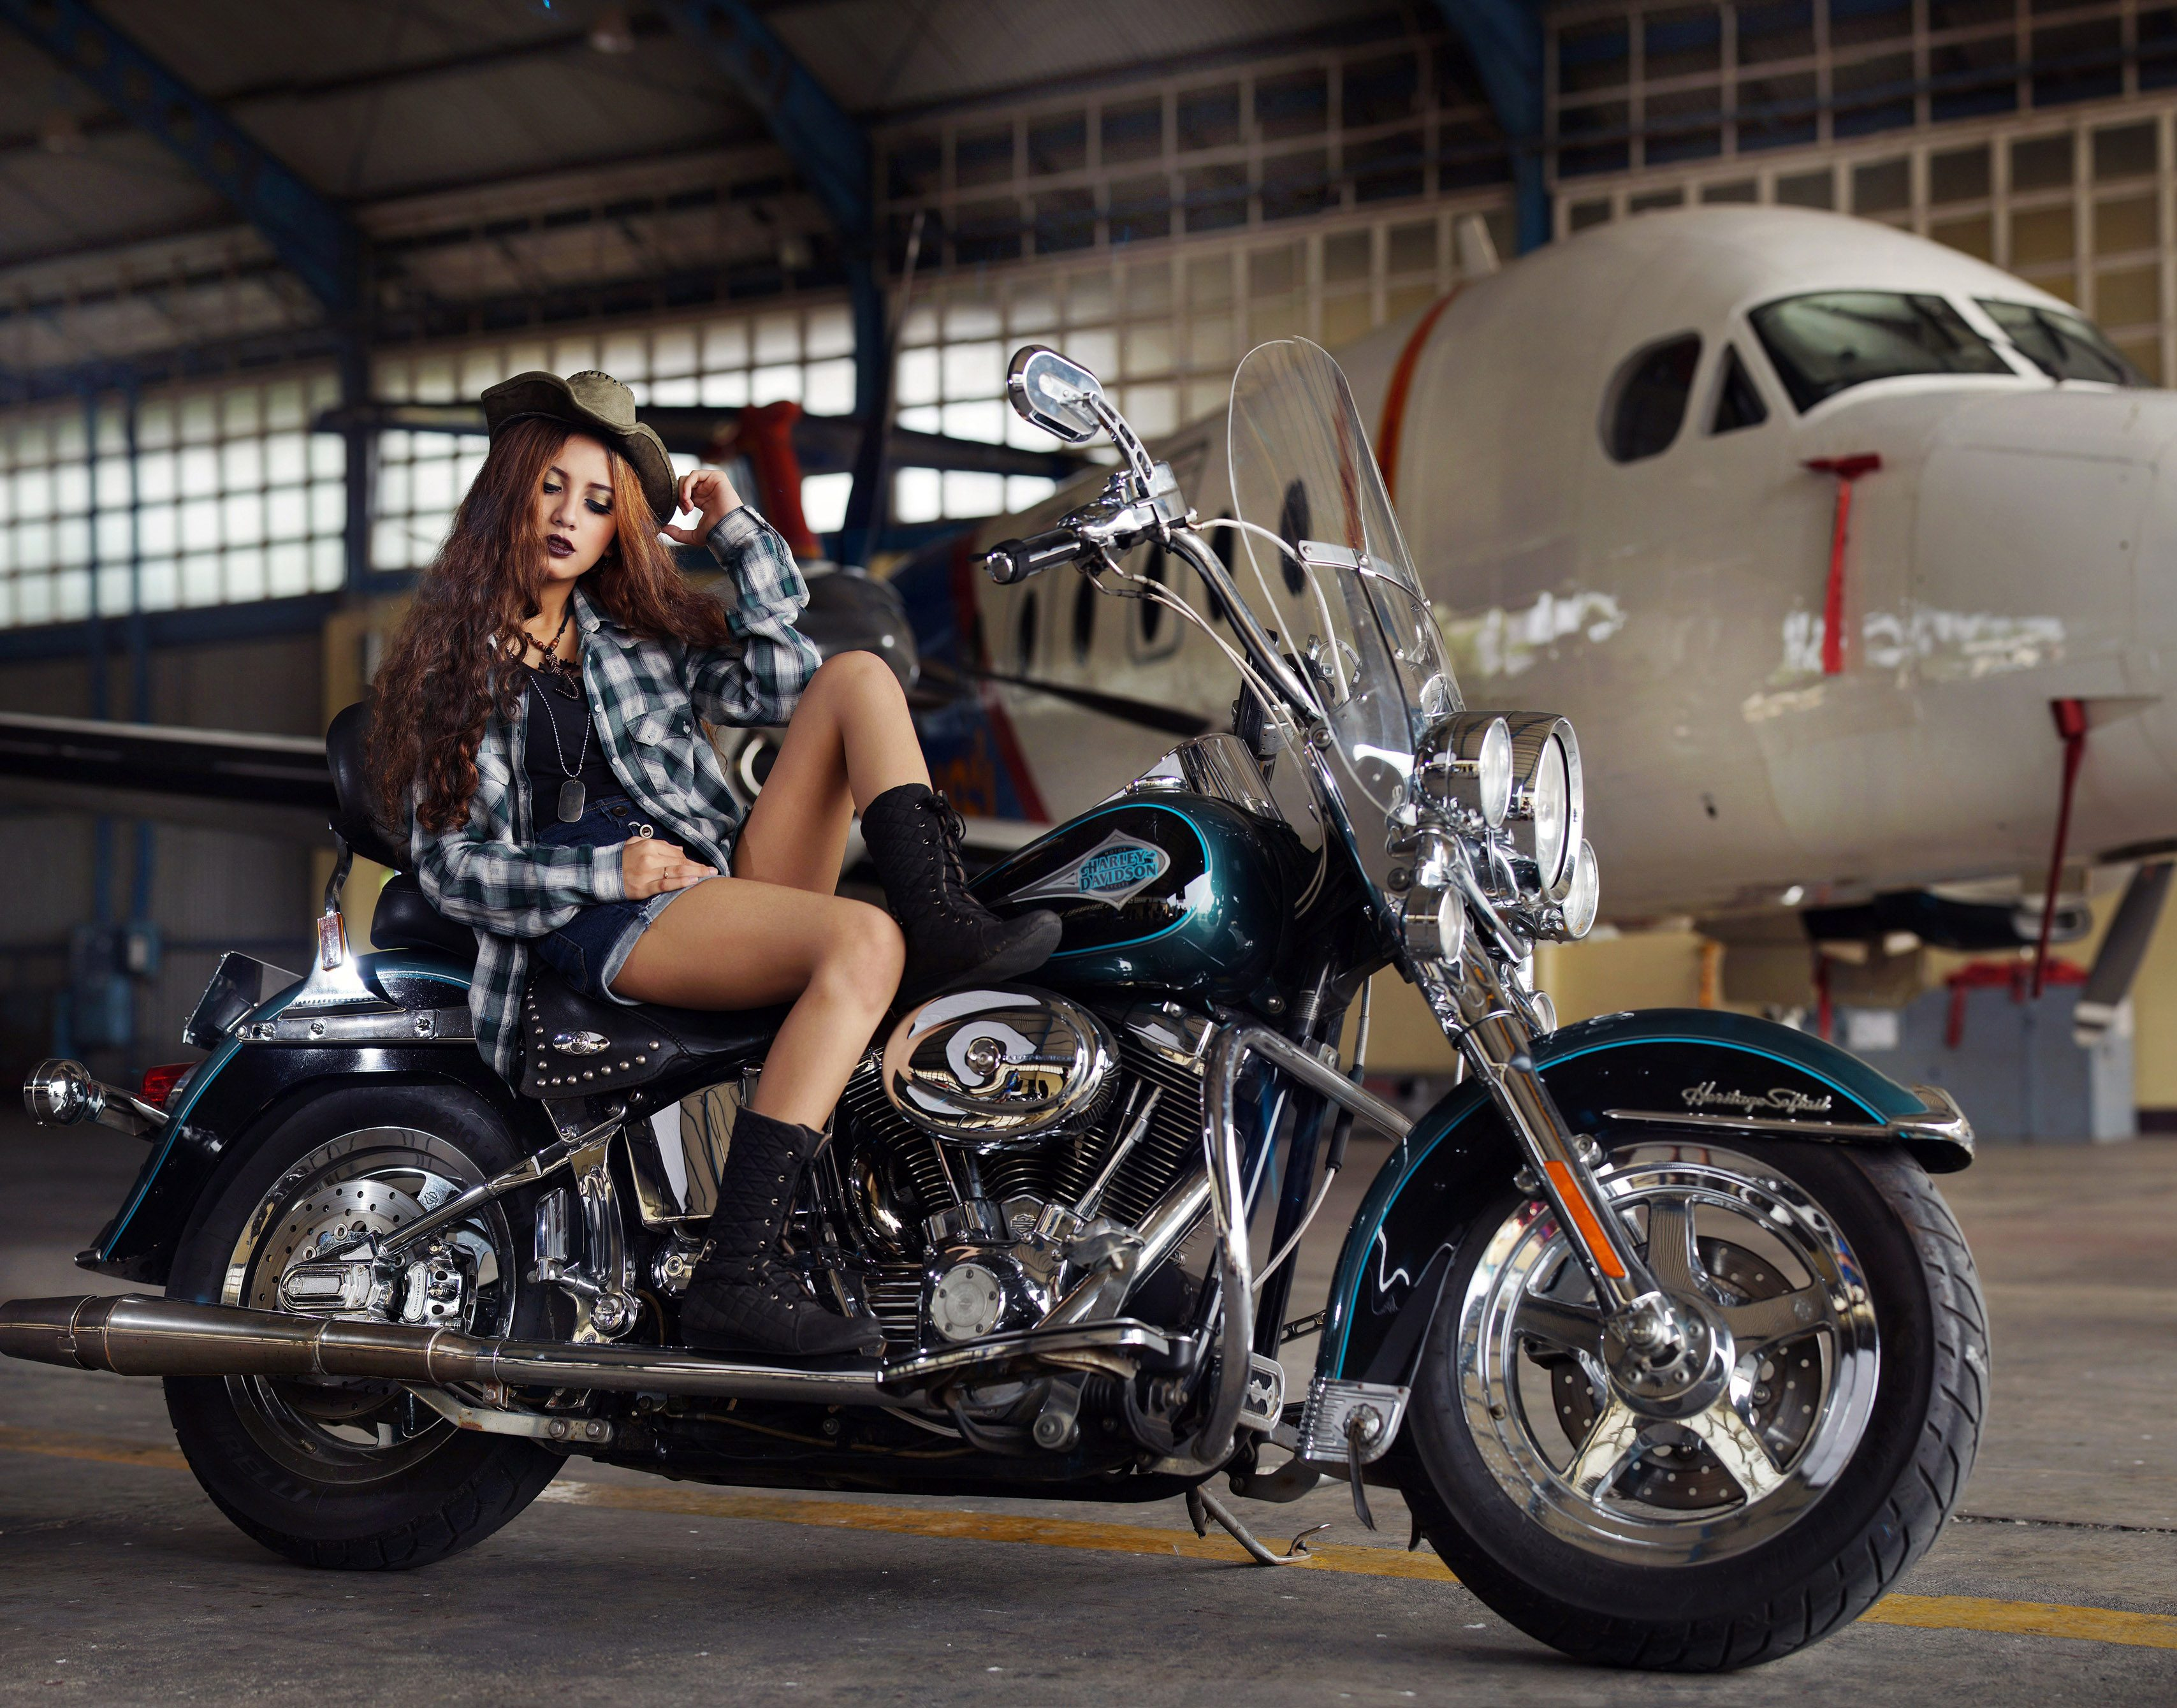 Fashion Girl Bike Harley Davidson Blue 4k Wallpaper Best Wallpapers